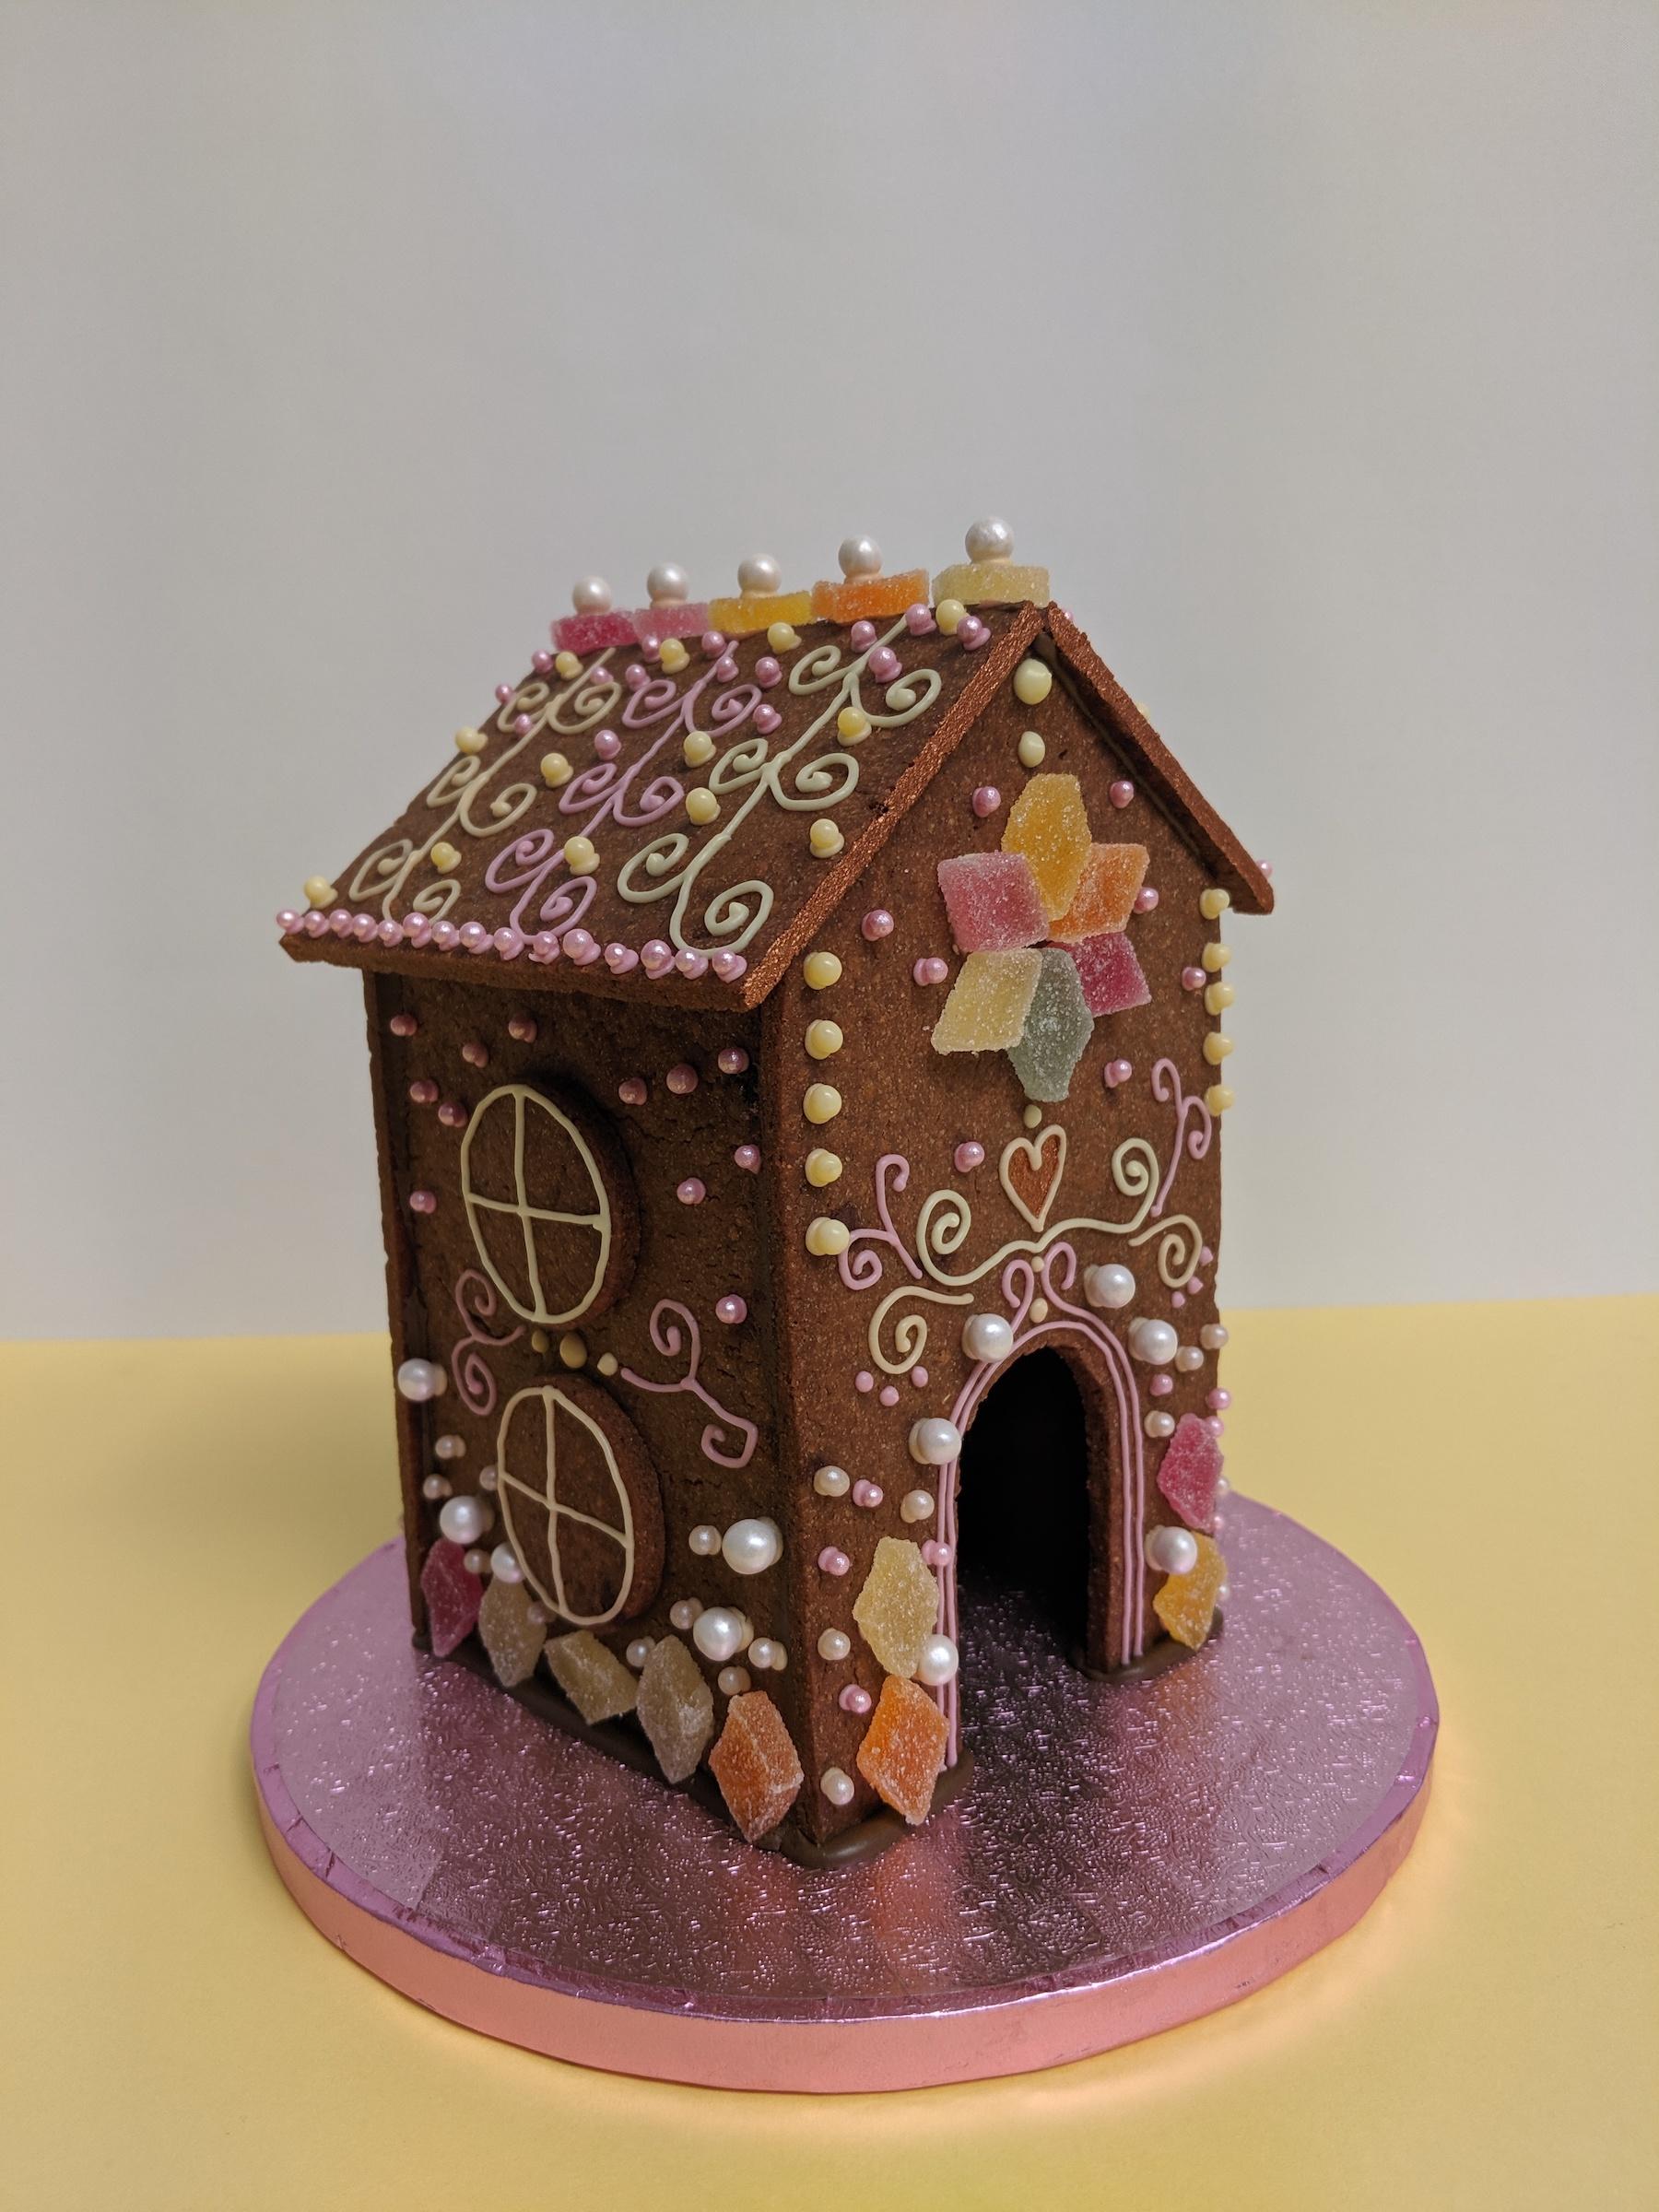 Vegan gingerbread house Maid of Gingerbread3.jpg